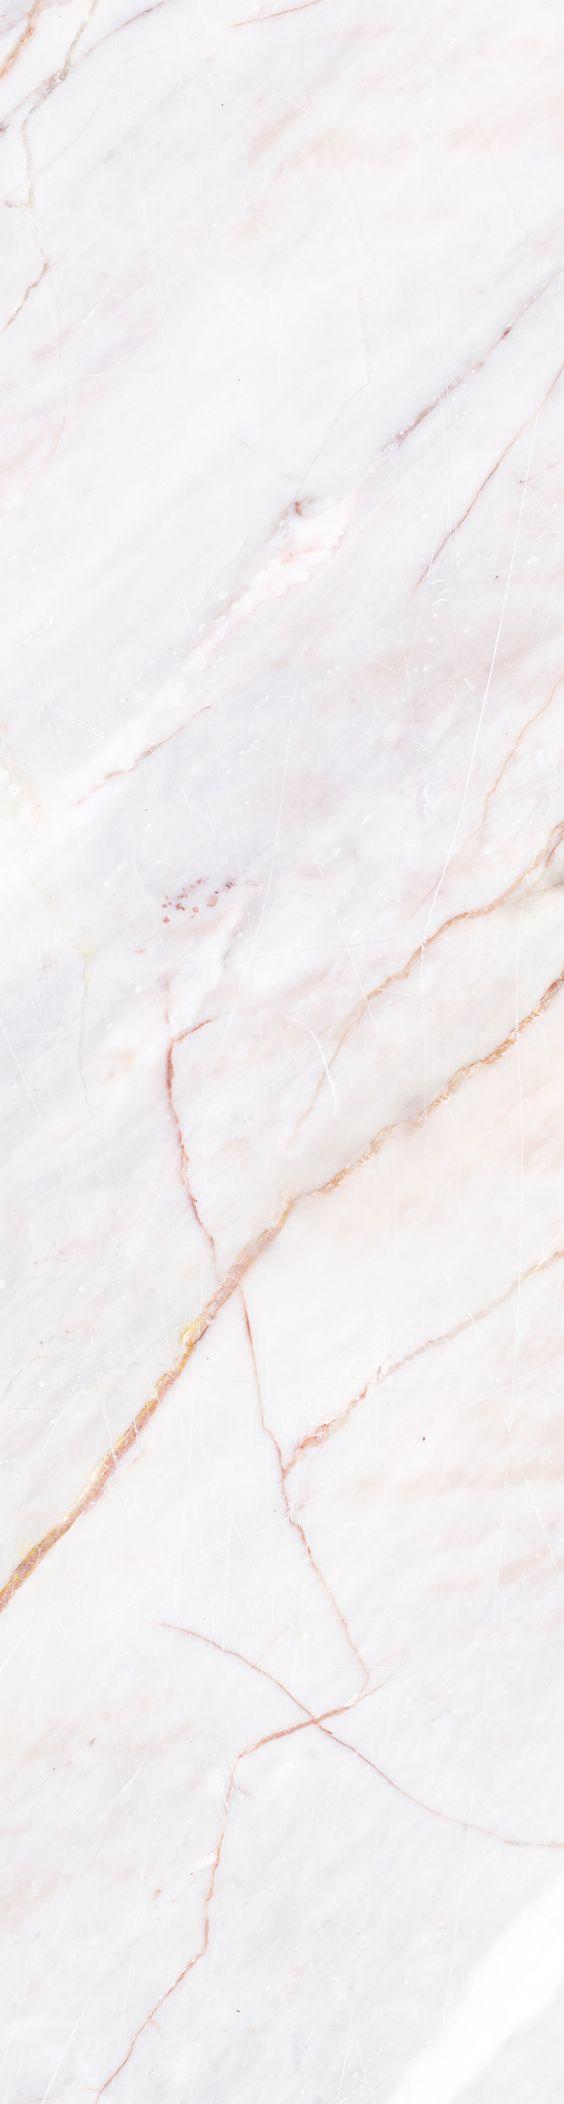 Fototapete Fresco Marble Cracked - # Cracked #Klein #Marmor #Pint #Pinted #Crack...